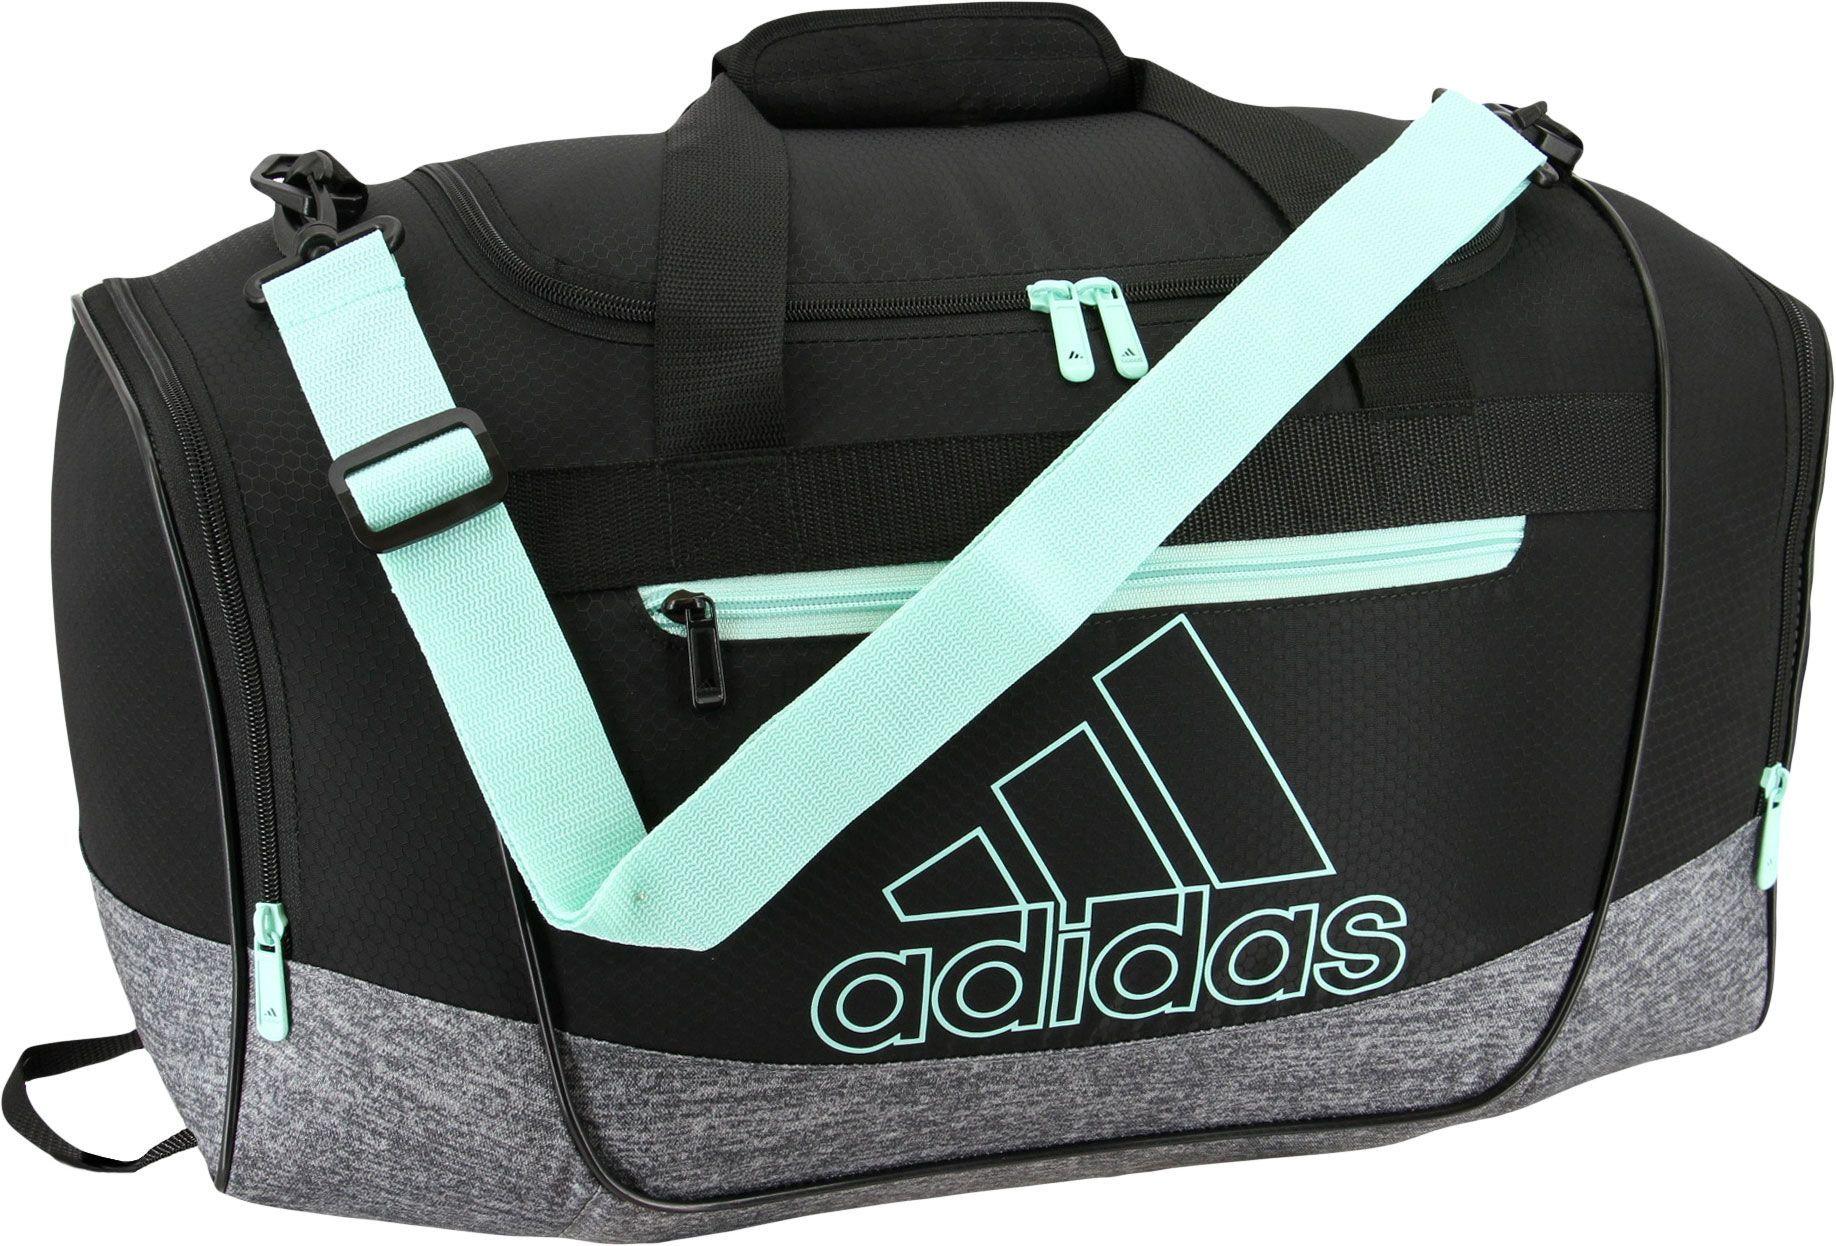 Adidas Defender Iii Small Duffle Bag Small Duffle Bag Duffle Bag Sports Adidas Duffle Bag